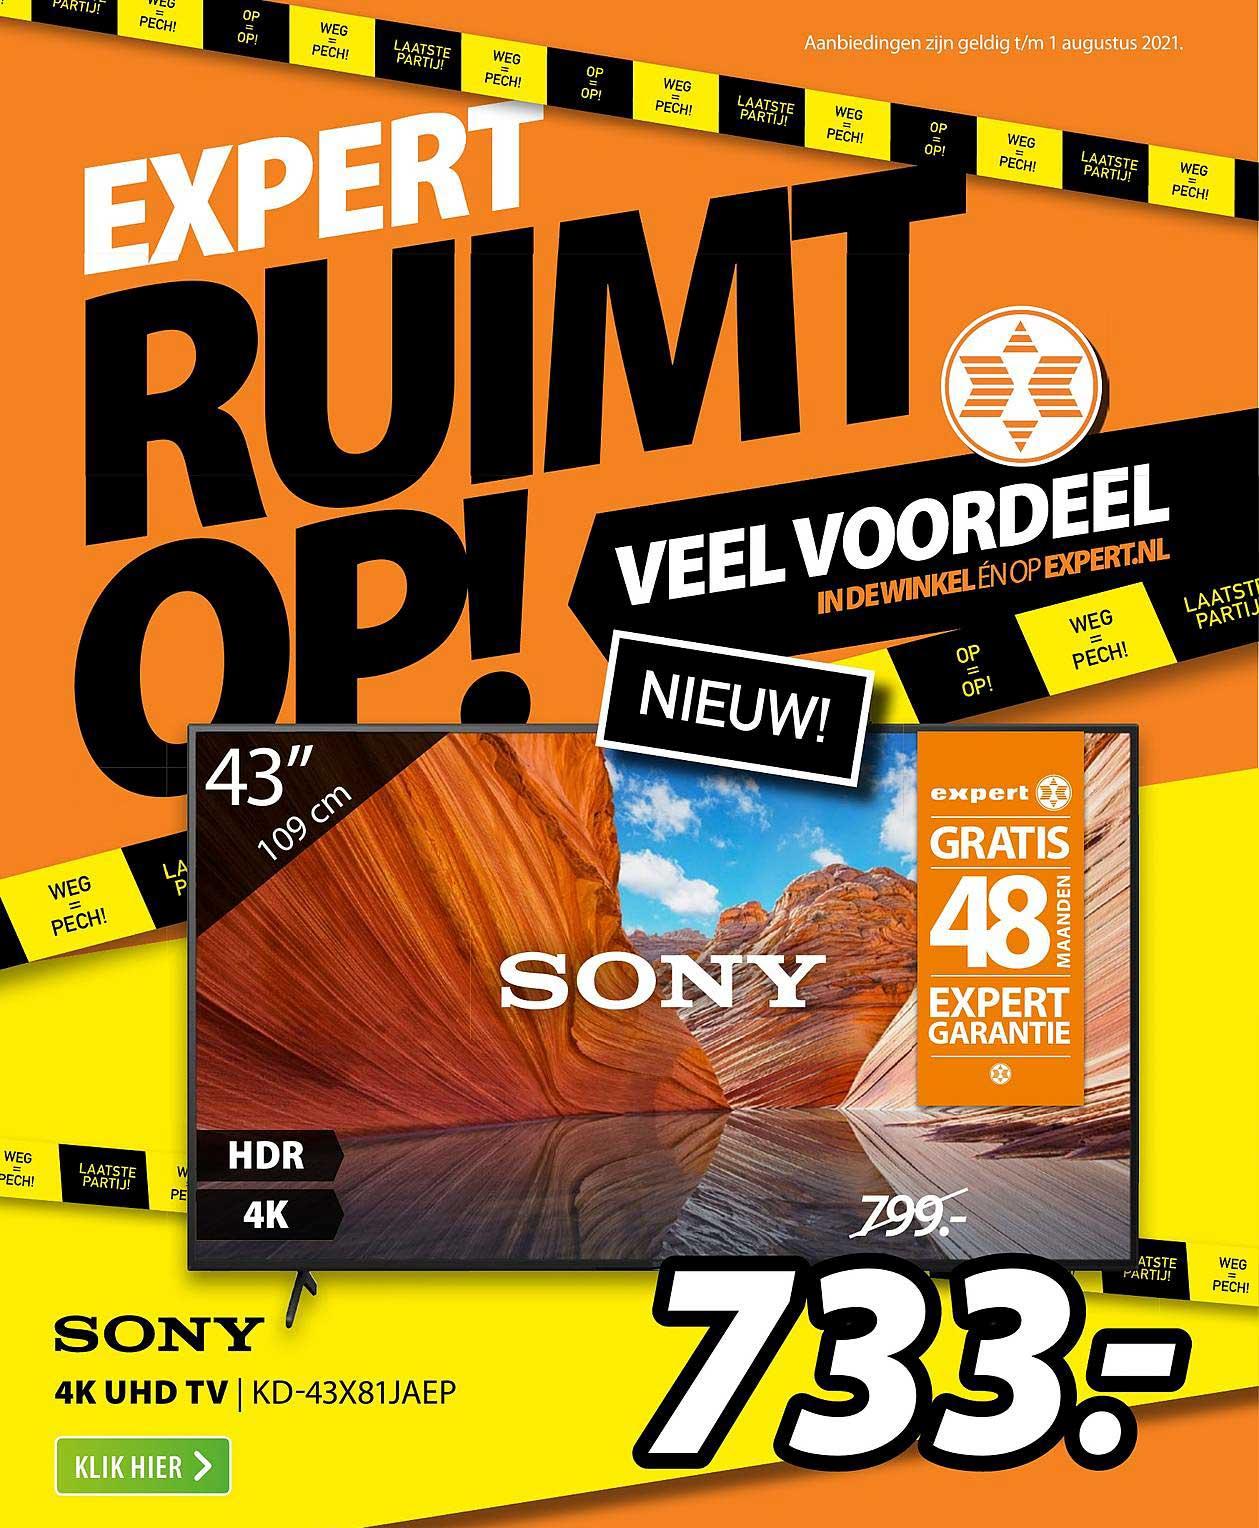 Expert Sony 4K UHD TV | KD-43X81JAEP